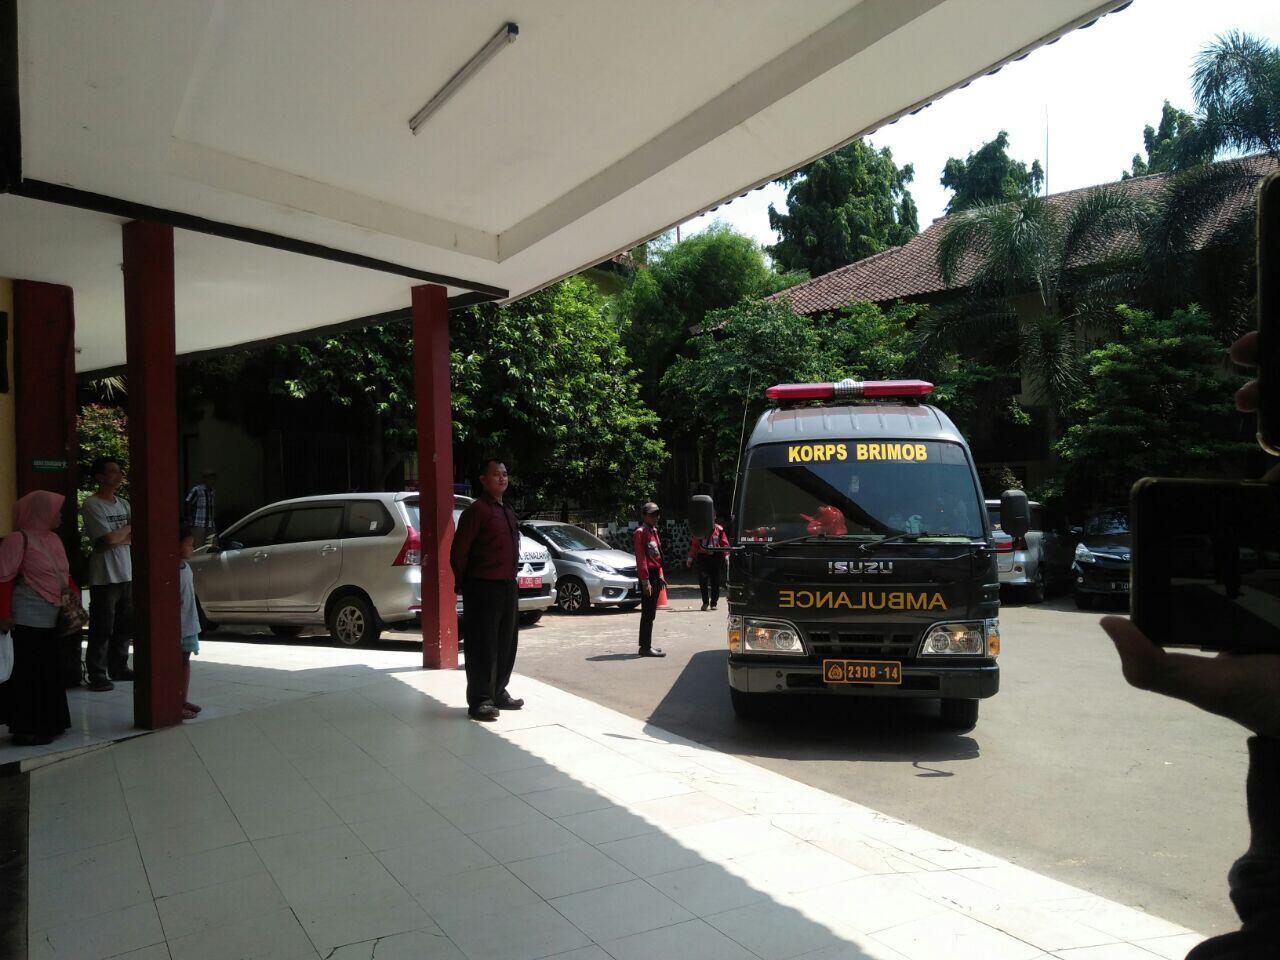 Bentrokan di Mako Brimob, 6 Kantong Jenazah Tiba di RS Polri